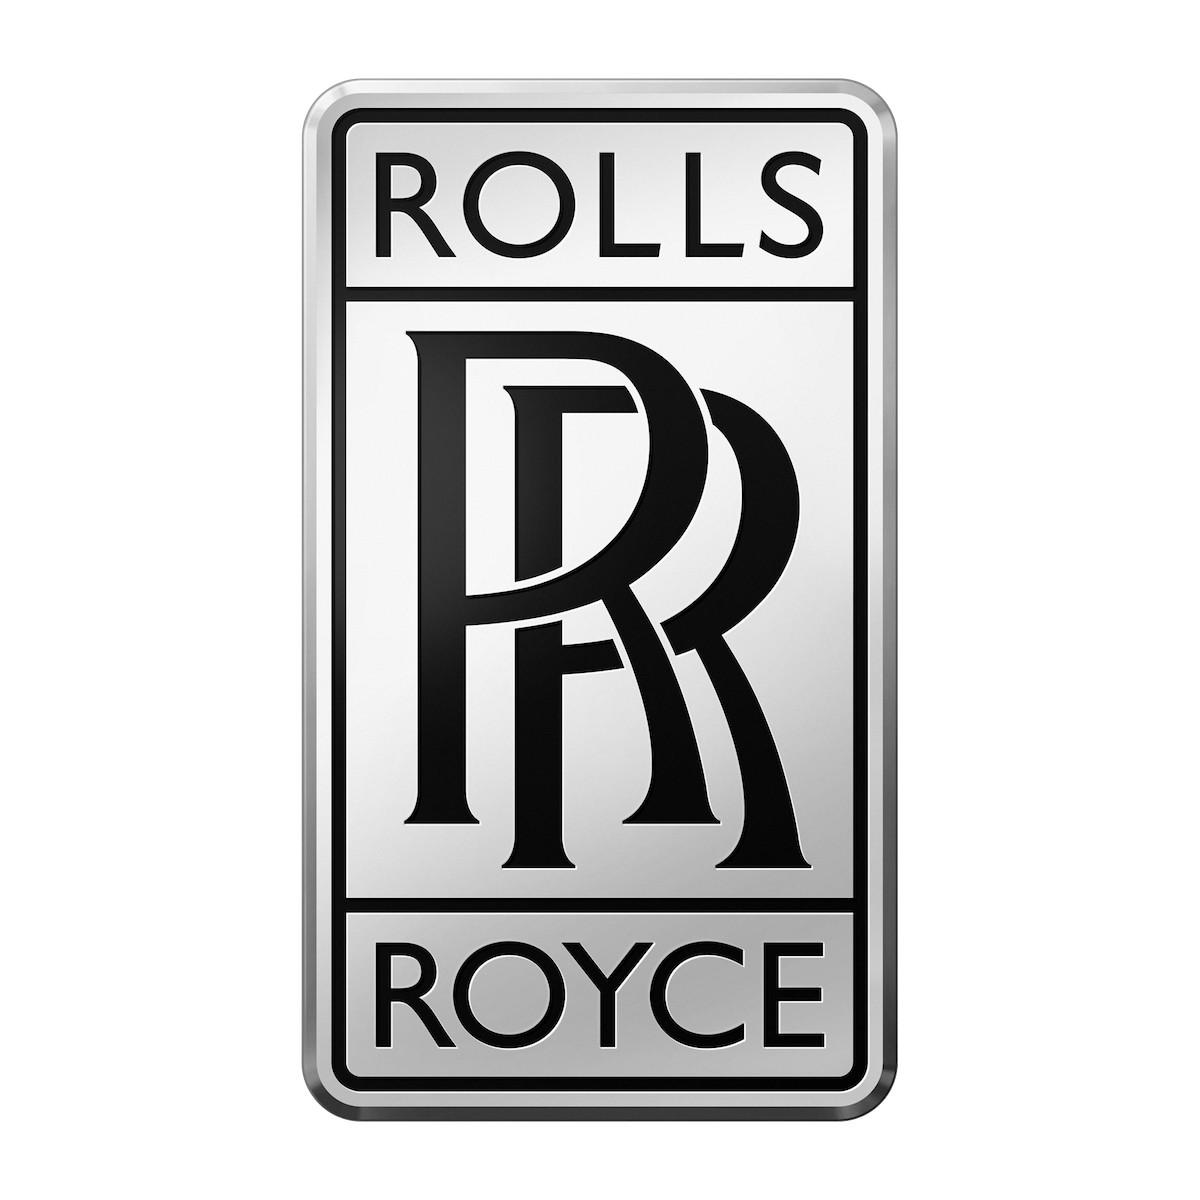 Rolls Royce of Palm Beach